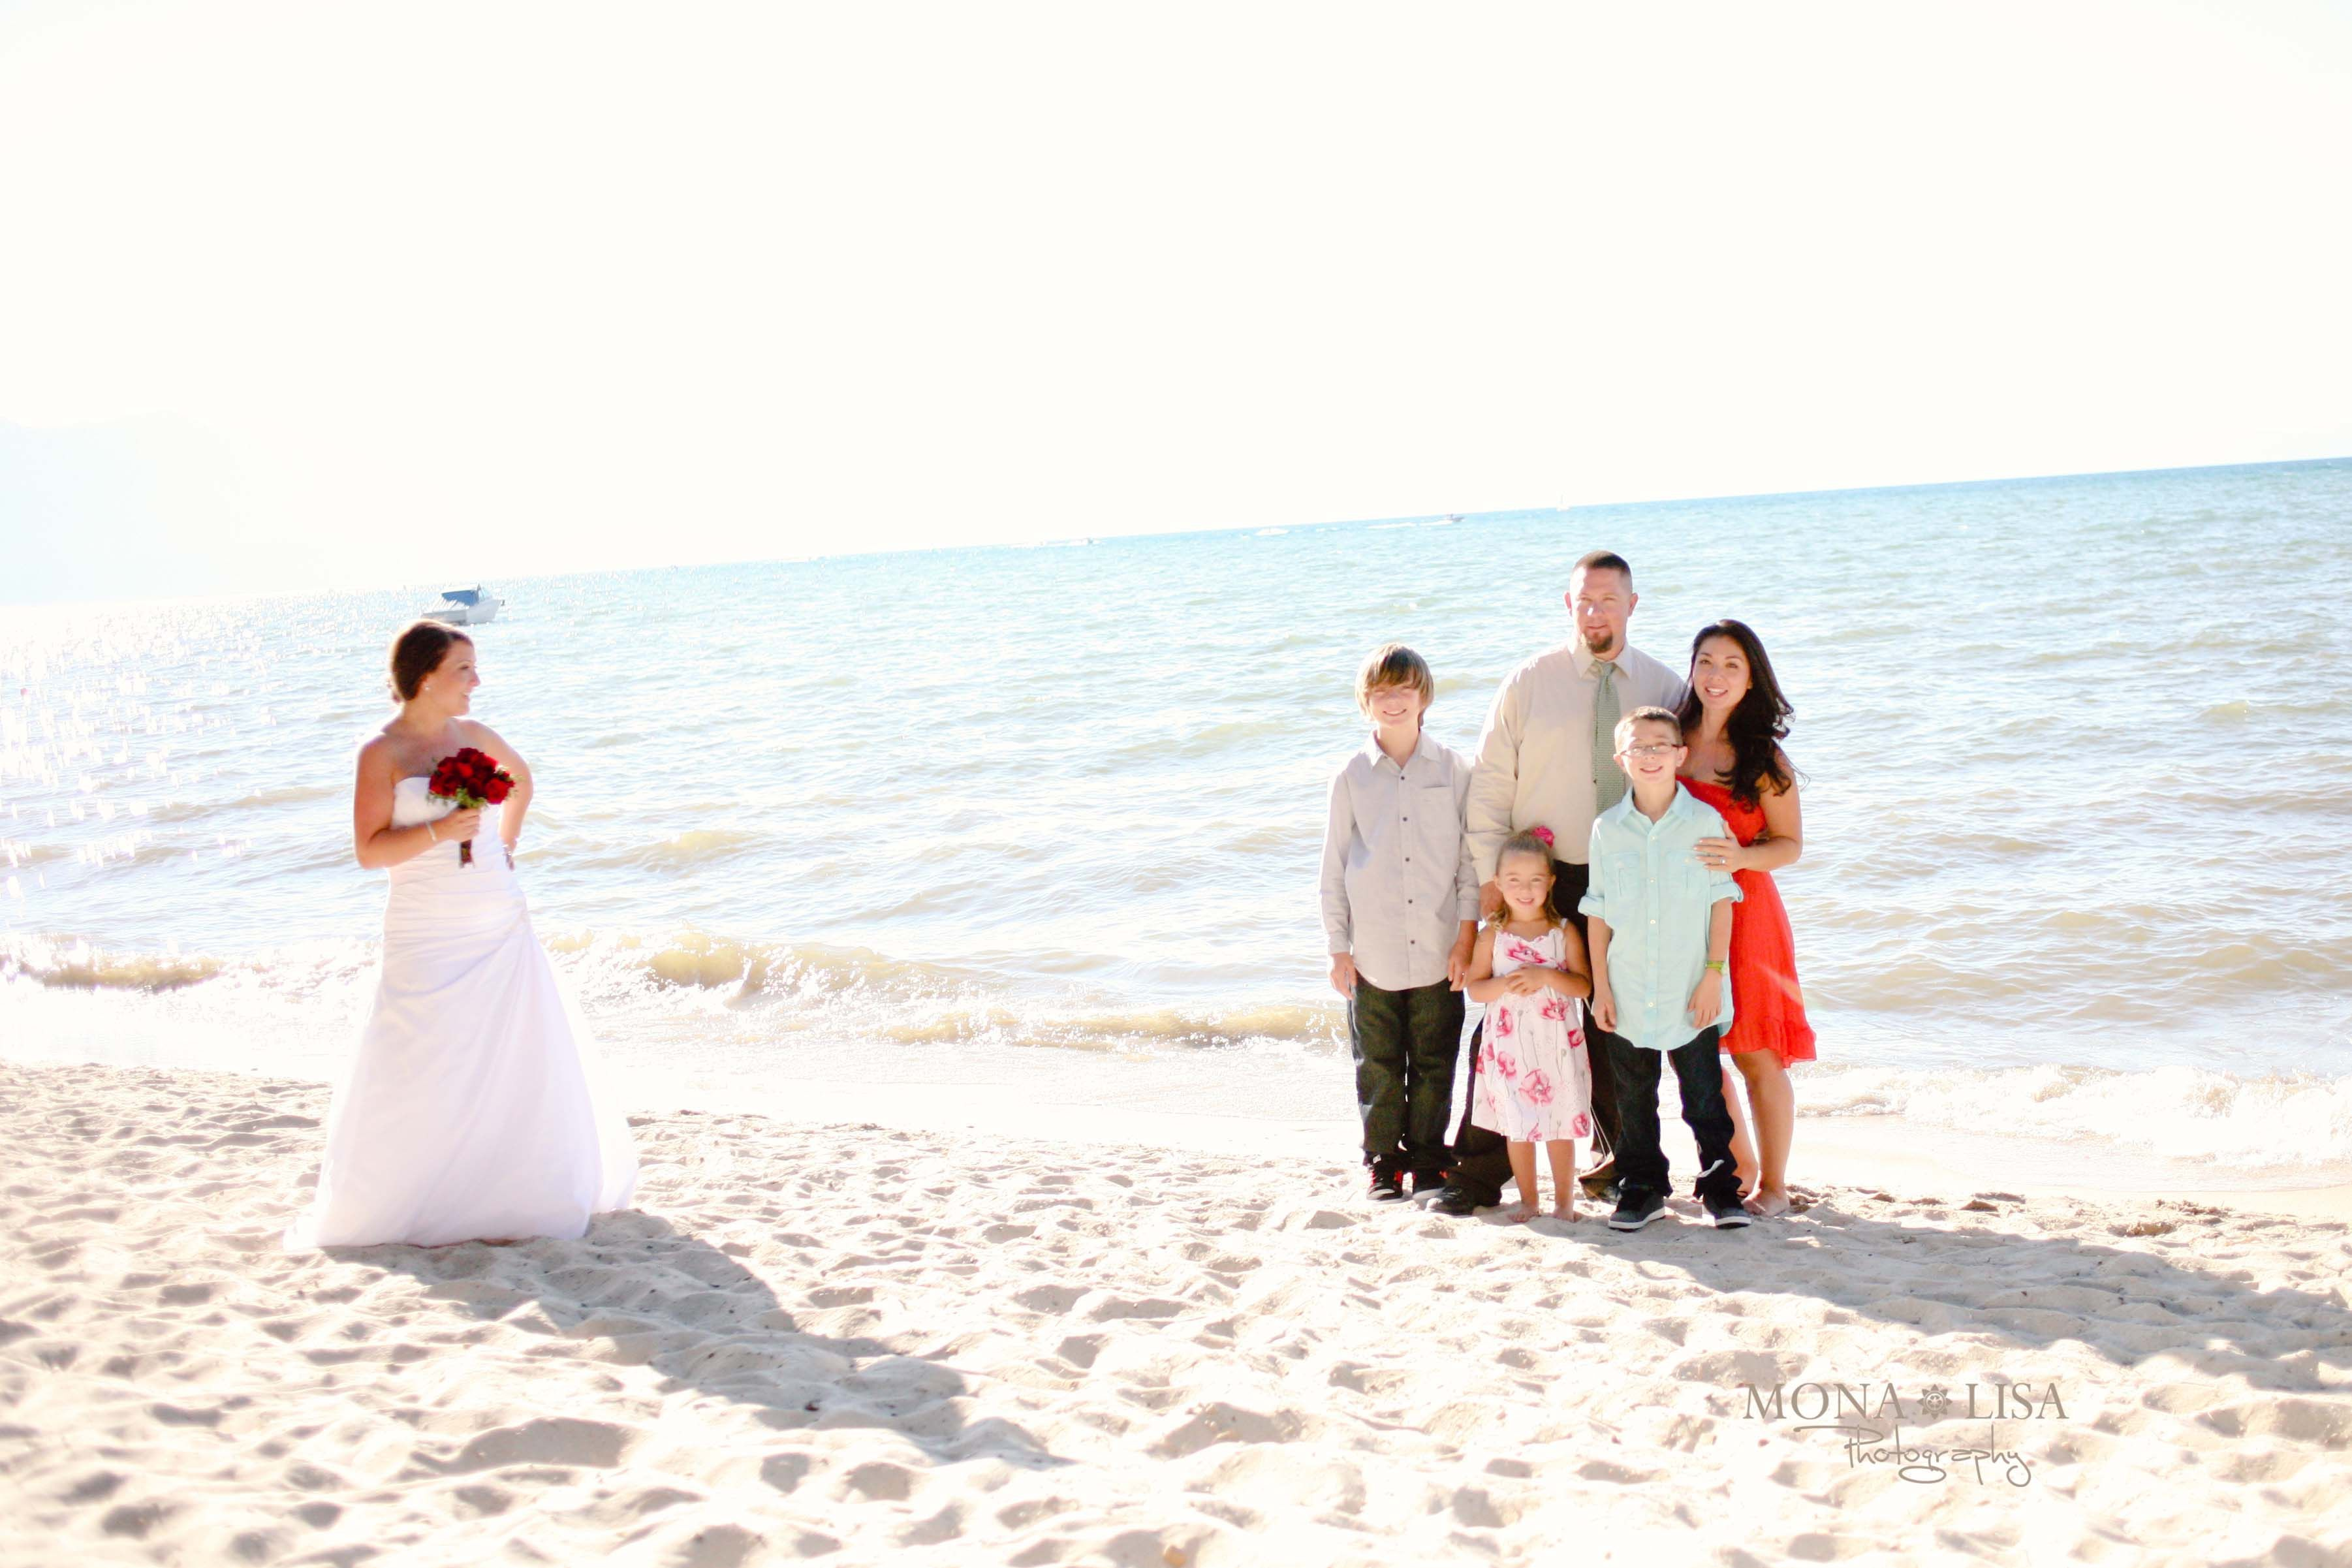 Wedding photo highjackers! LOL